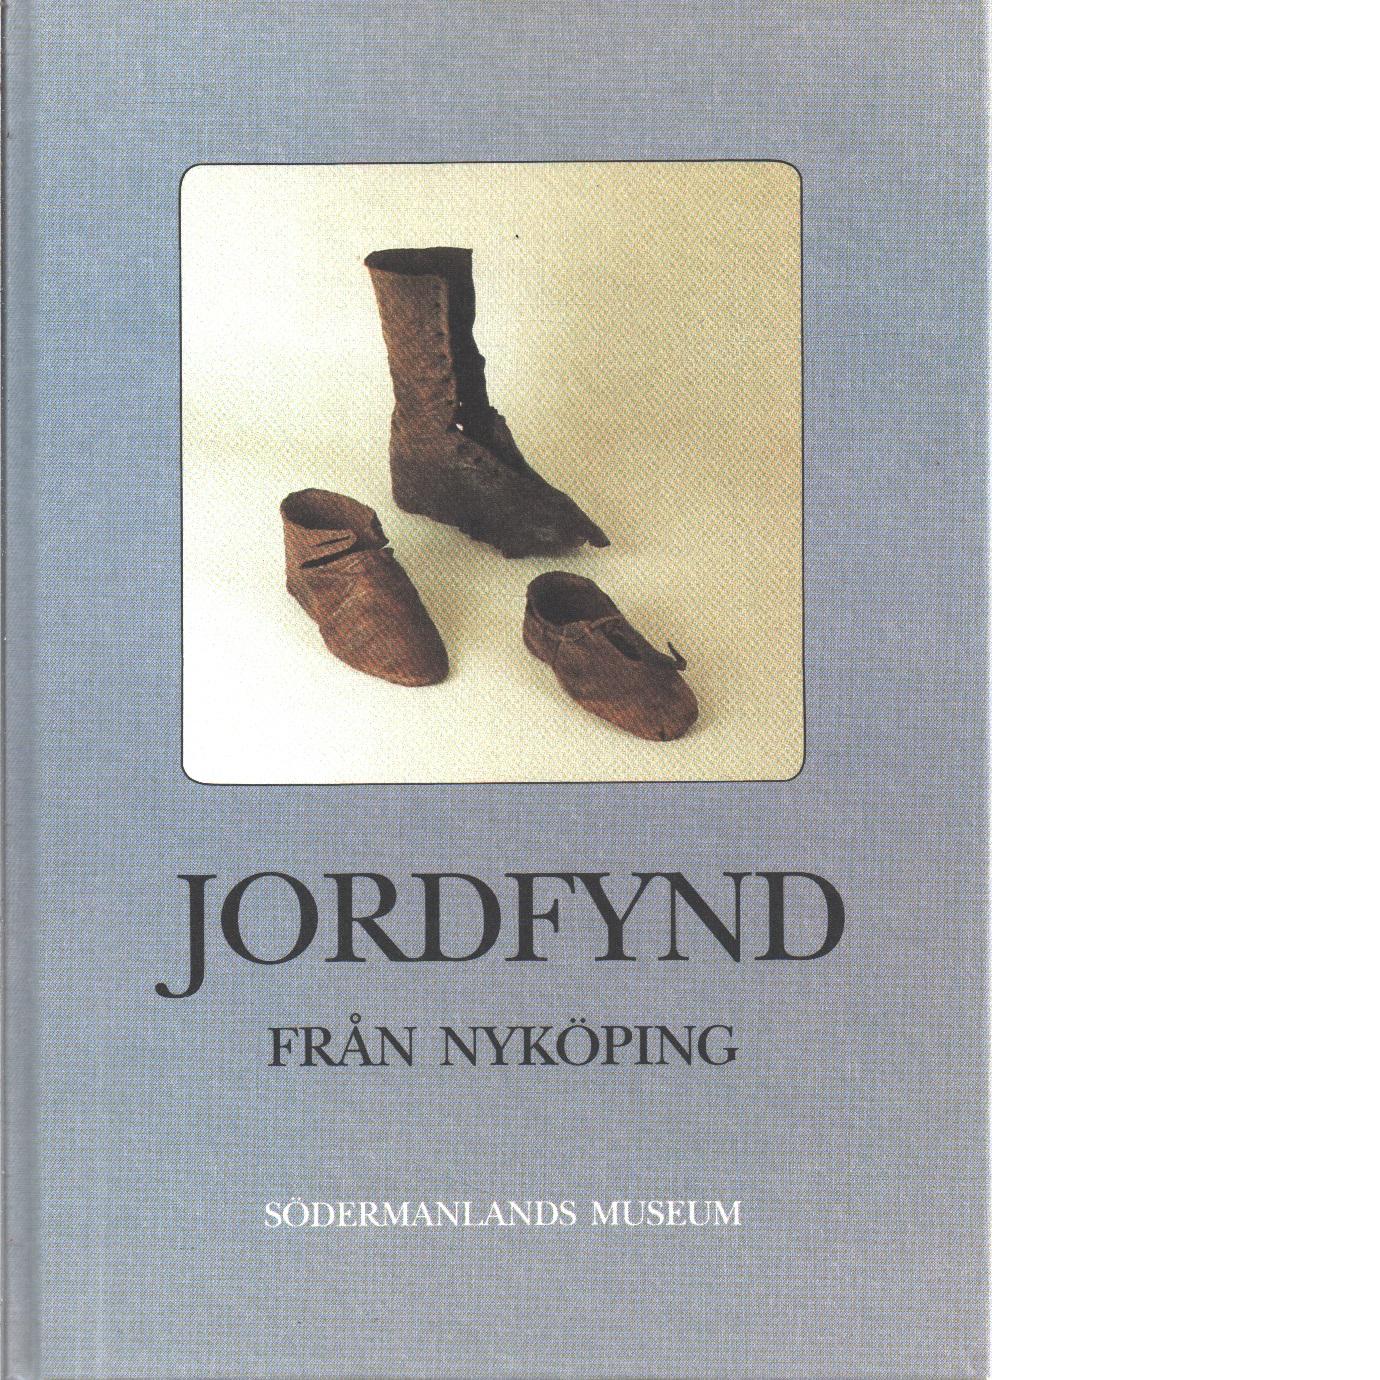 Jordfynd från Nyköping - Wachtmeister, Alarik och Wachtmeister, Ingegerd